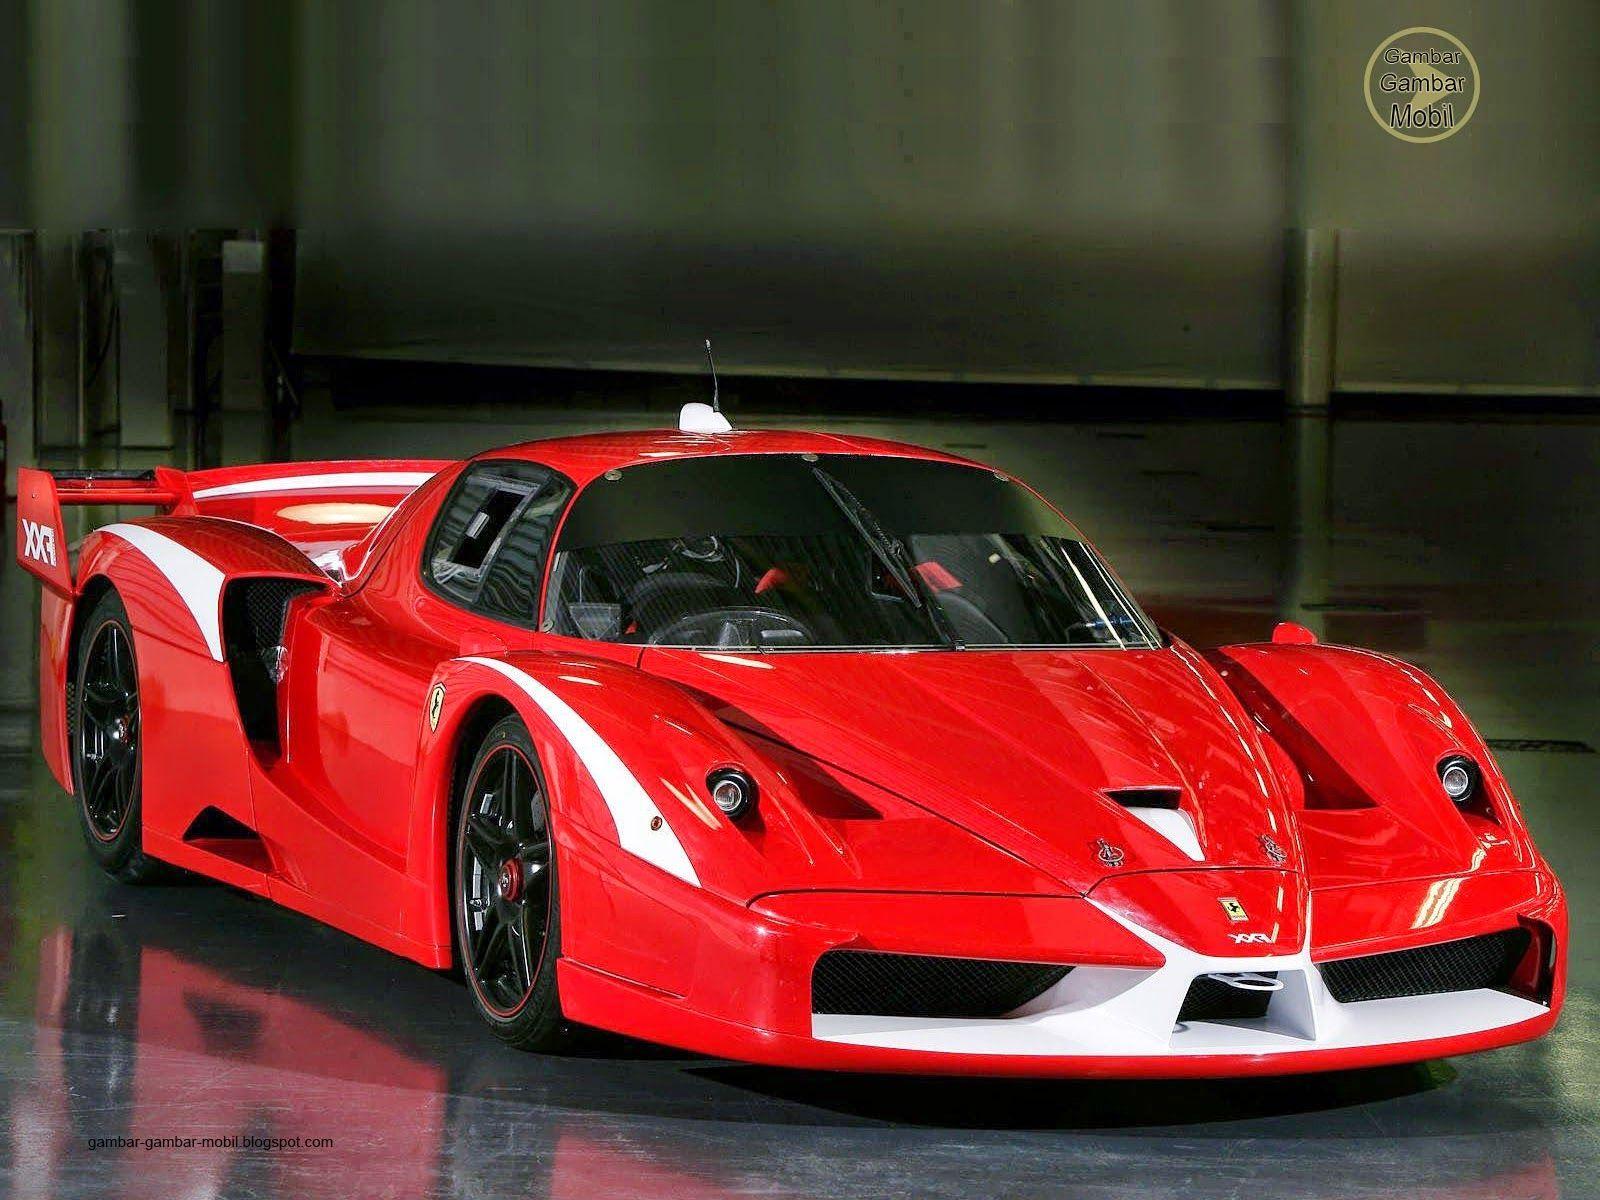 Gambar Transportasi : Gambar Mobil Sport Ferrari Enzo